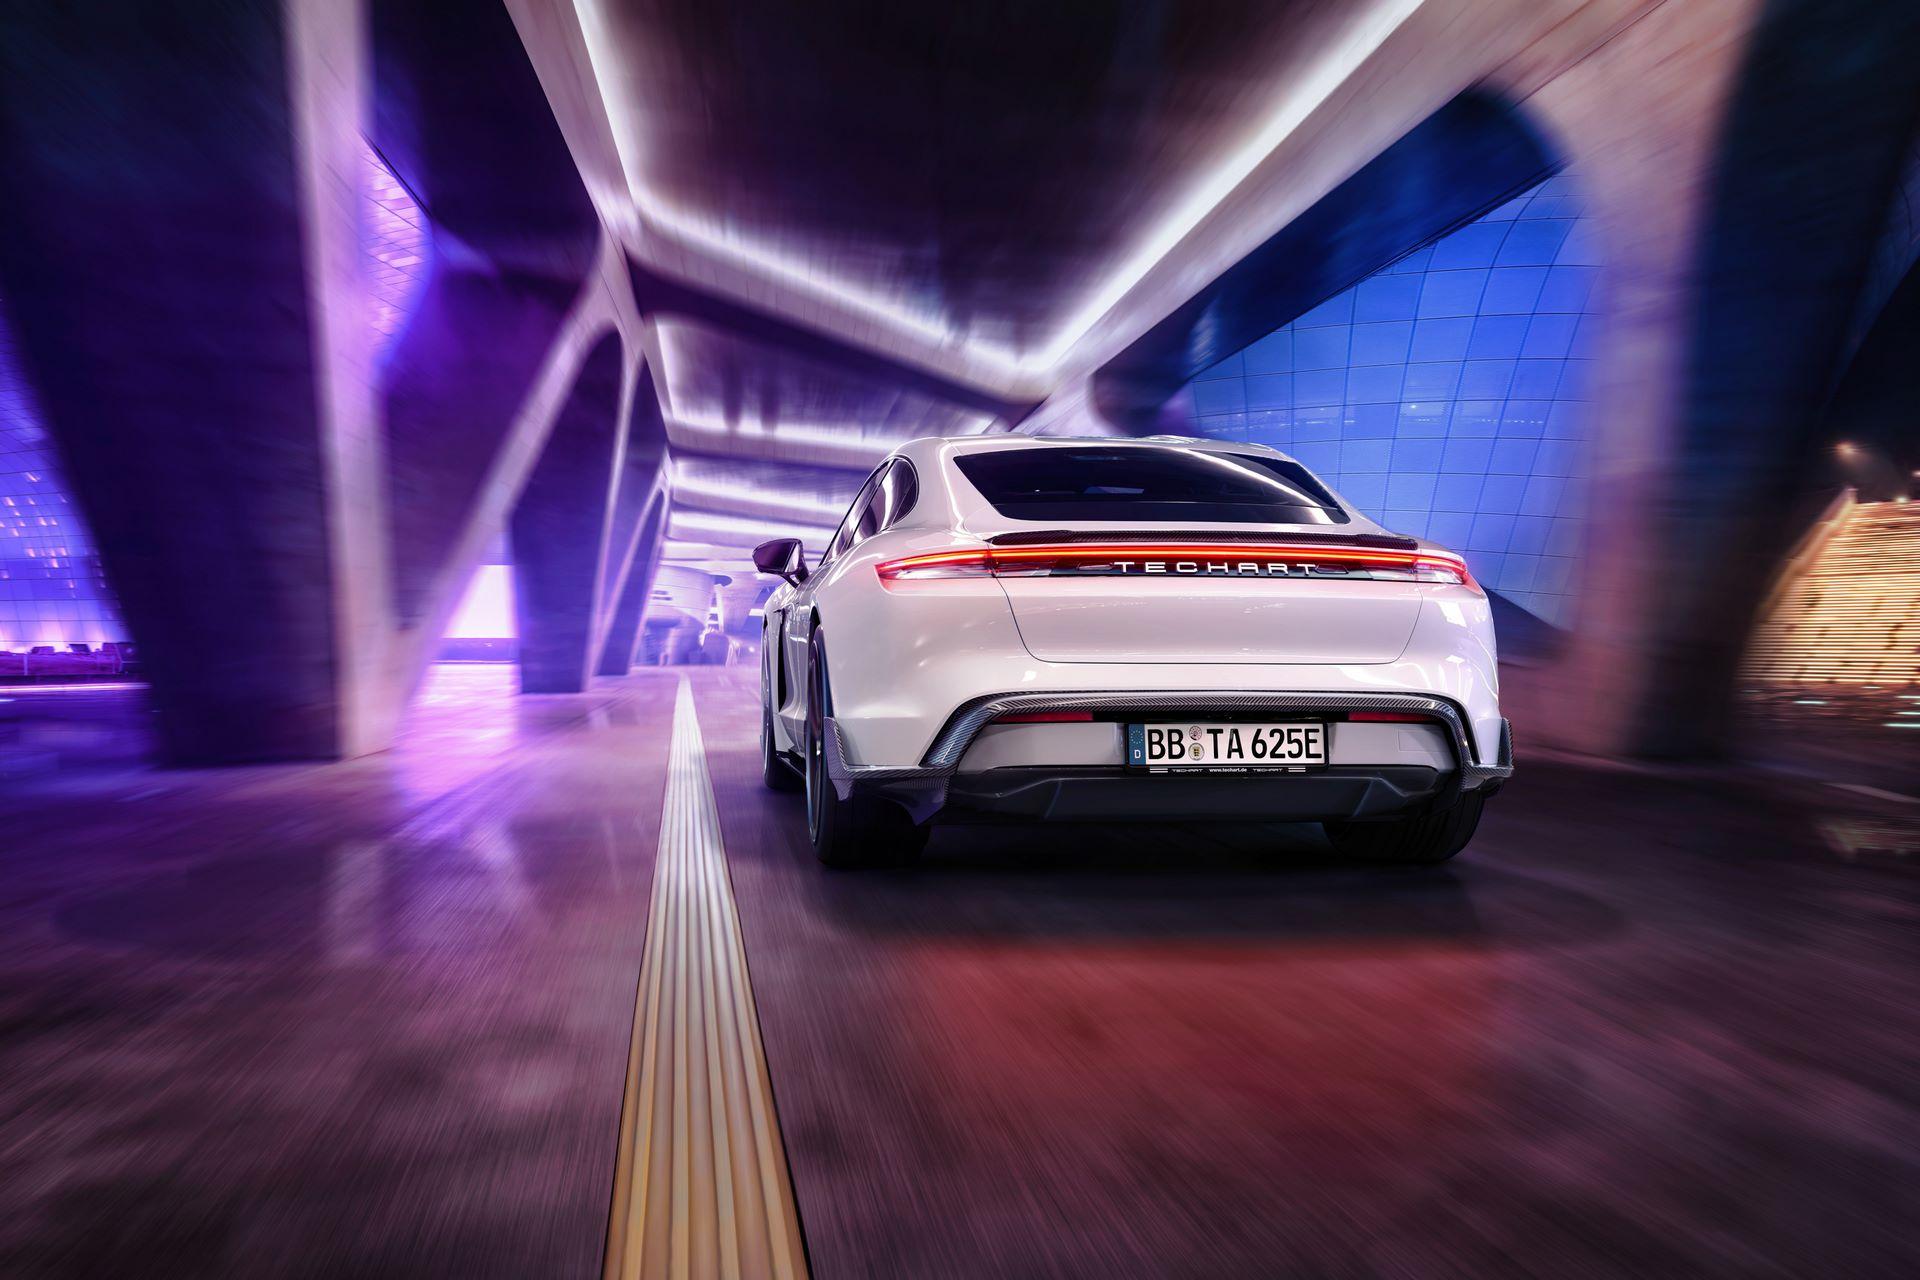 Porsche-Taycan-bodykit-by-TechArt-8